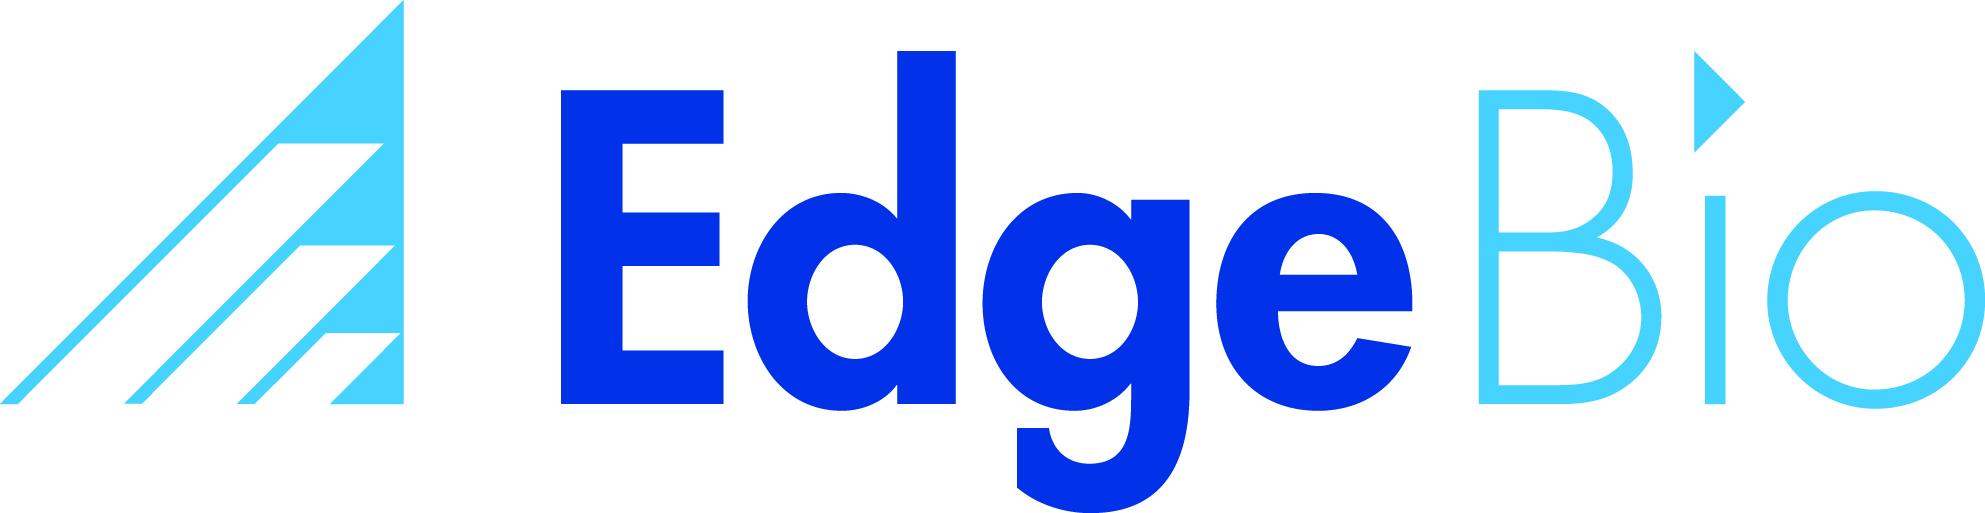 EdgeBioLogo_4c.jpg